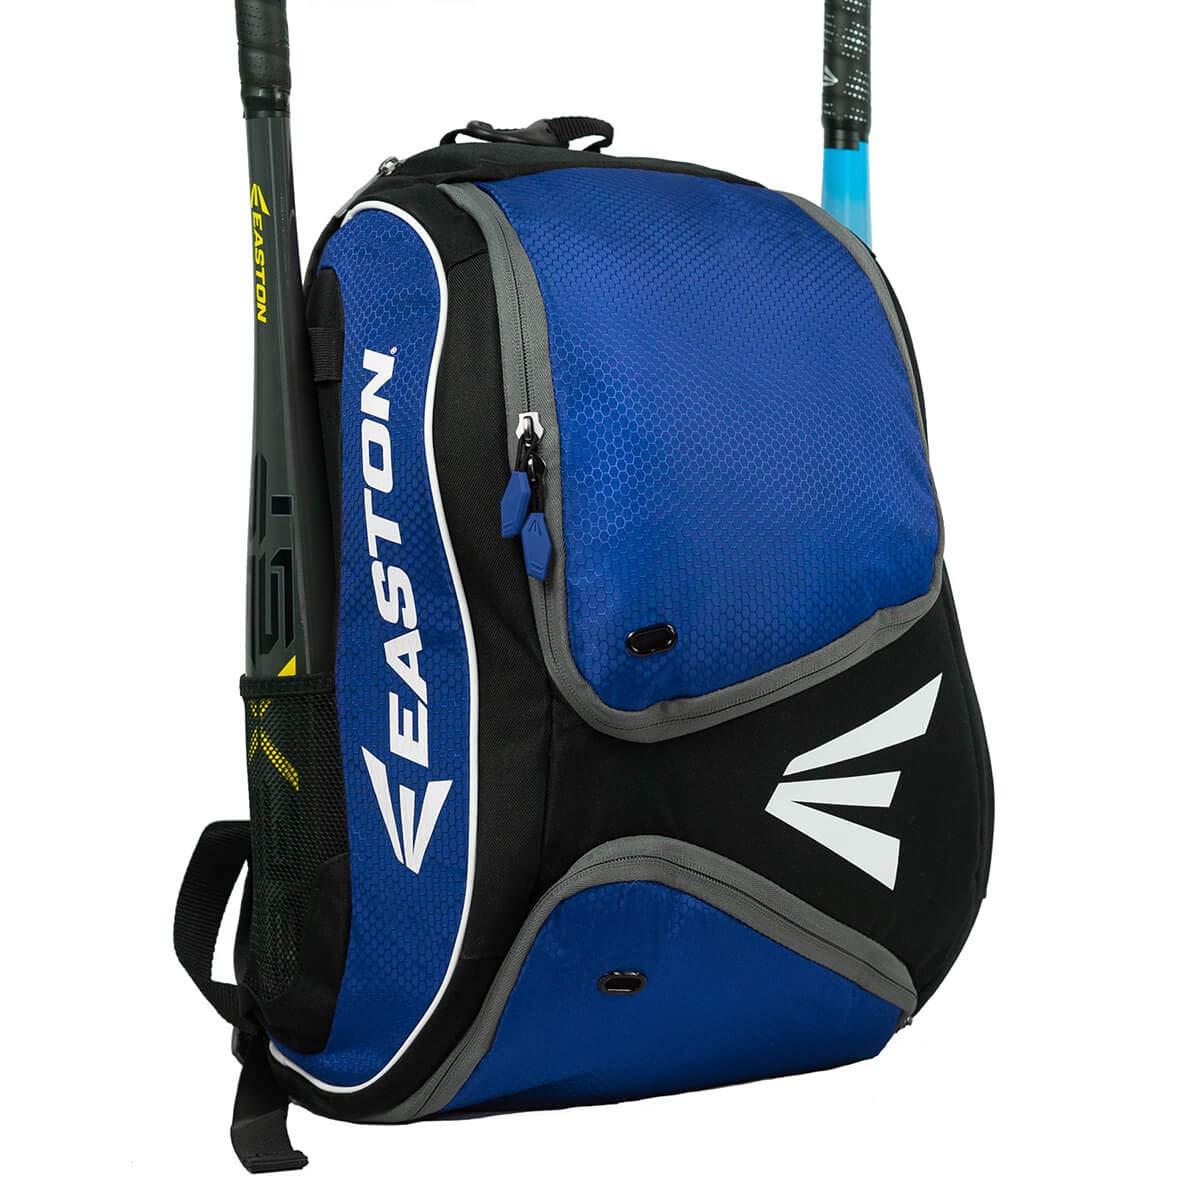 Easton E110BP Bat Pack (Solid Blue)